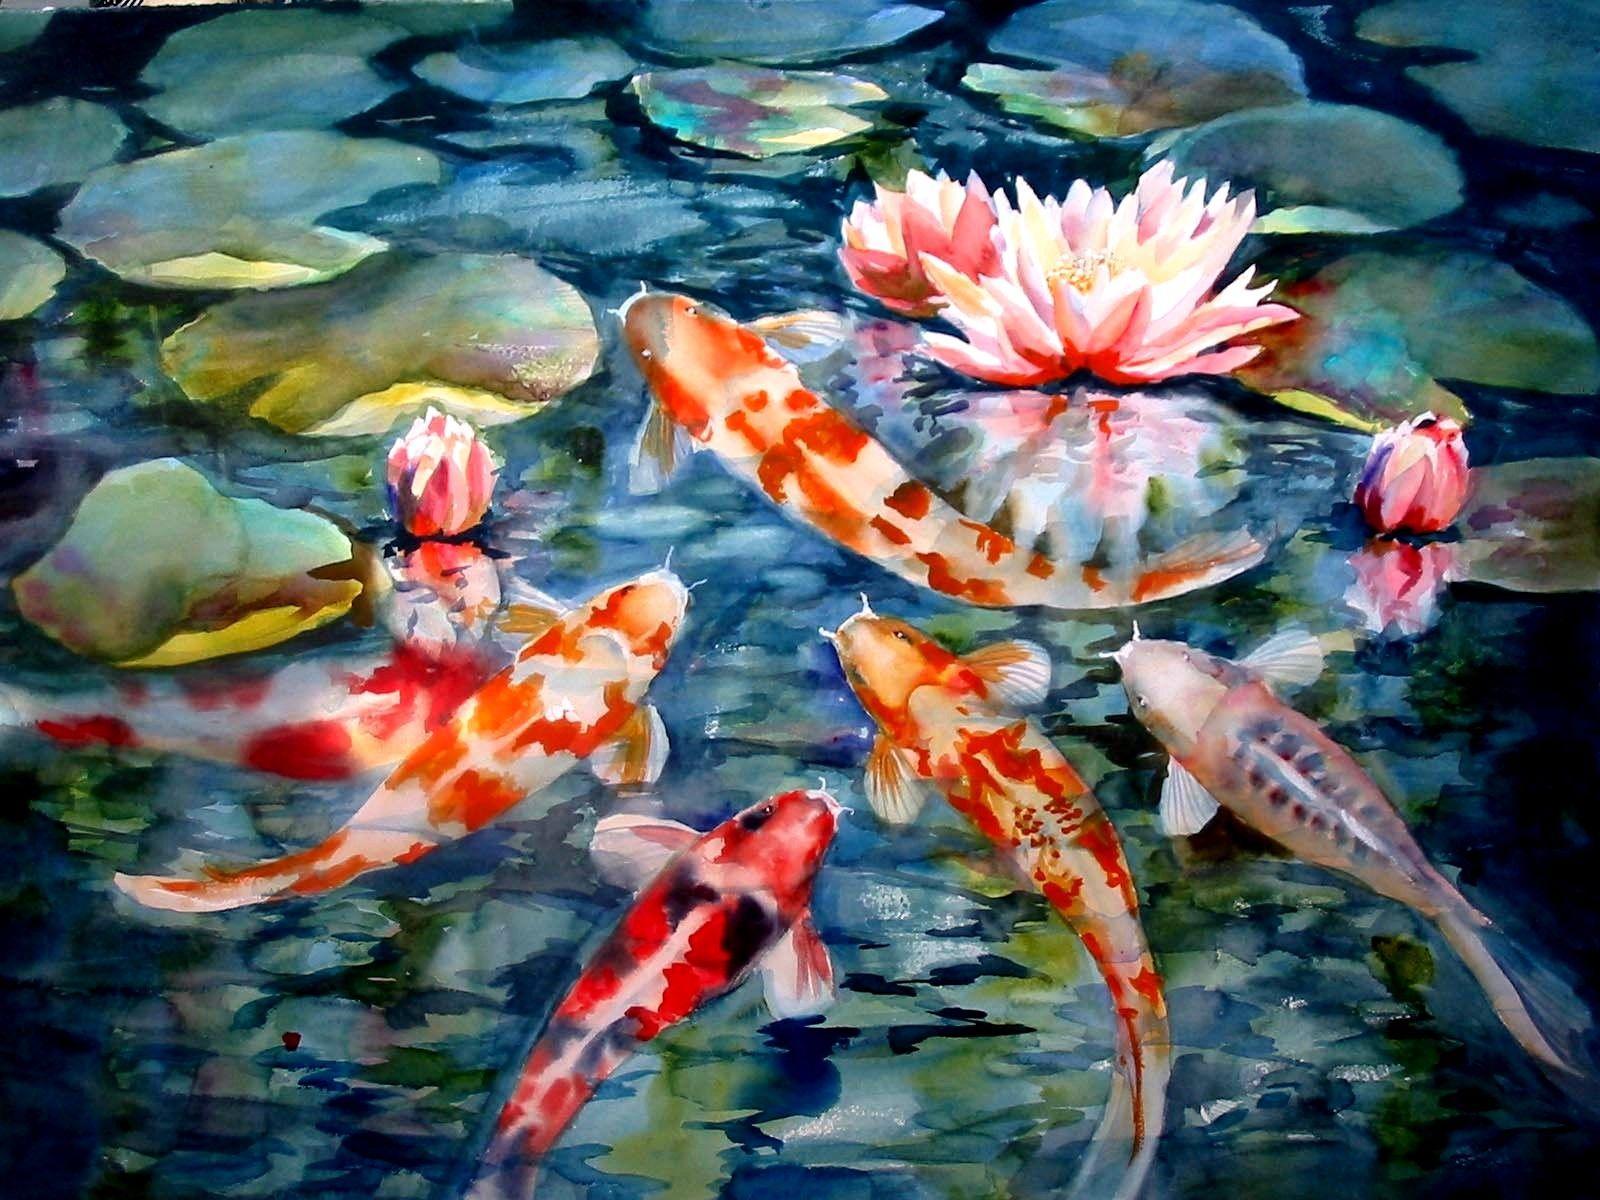 Japanese Koi Fish Pond Wallpapers Top Free Japanese Koi